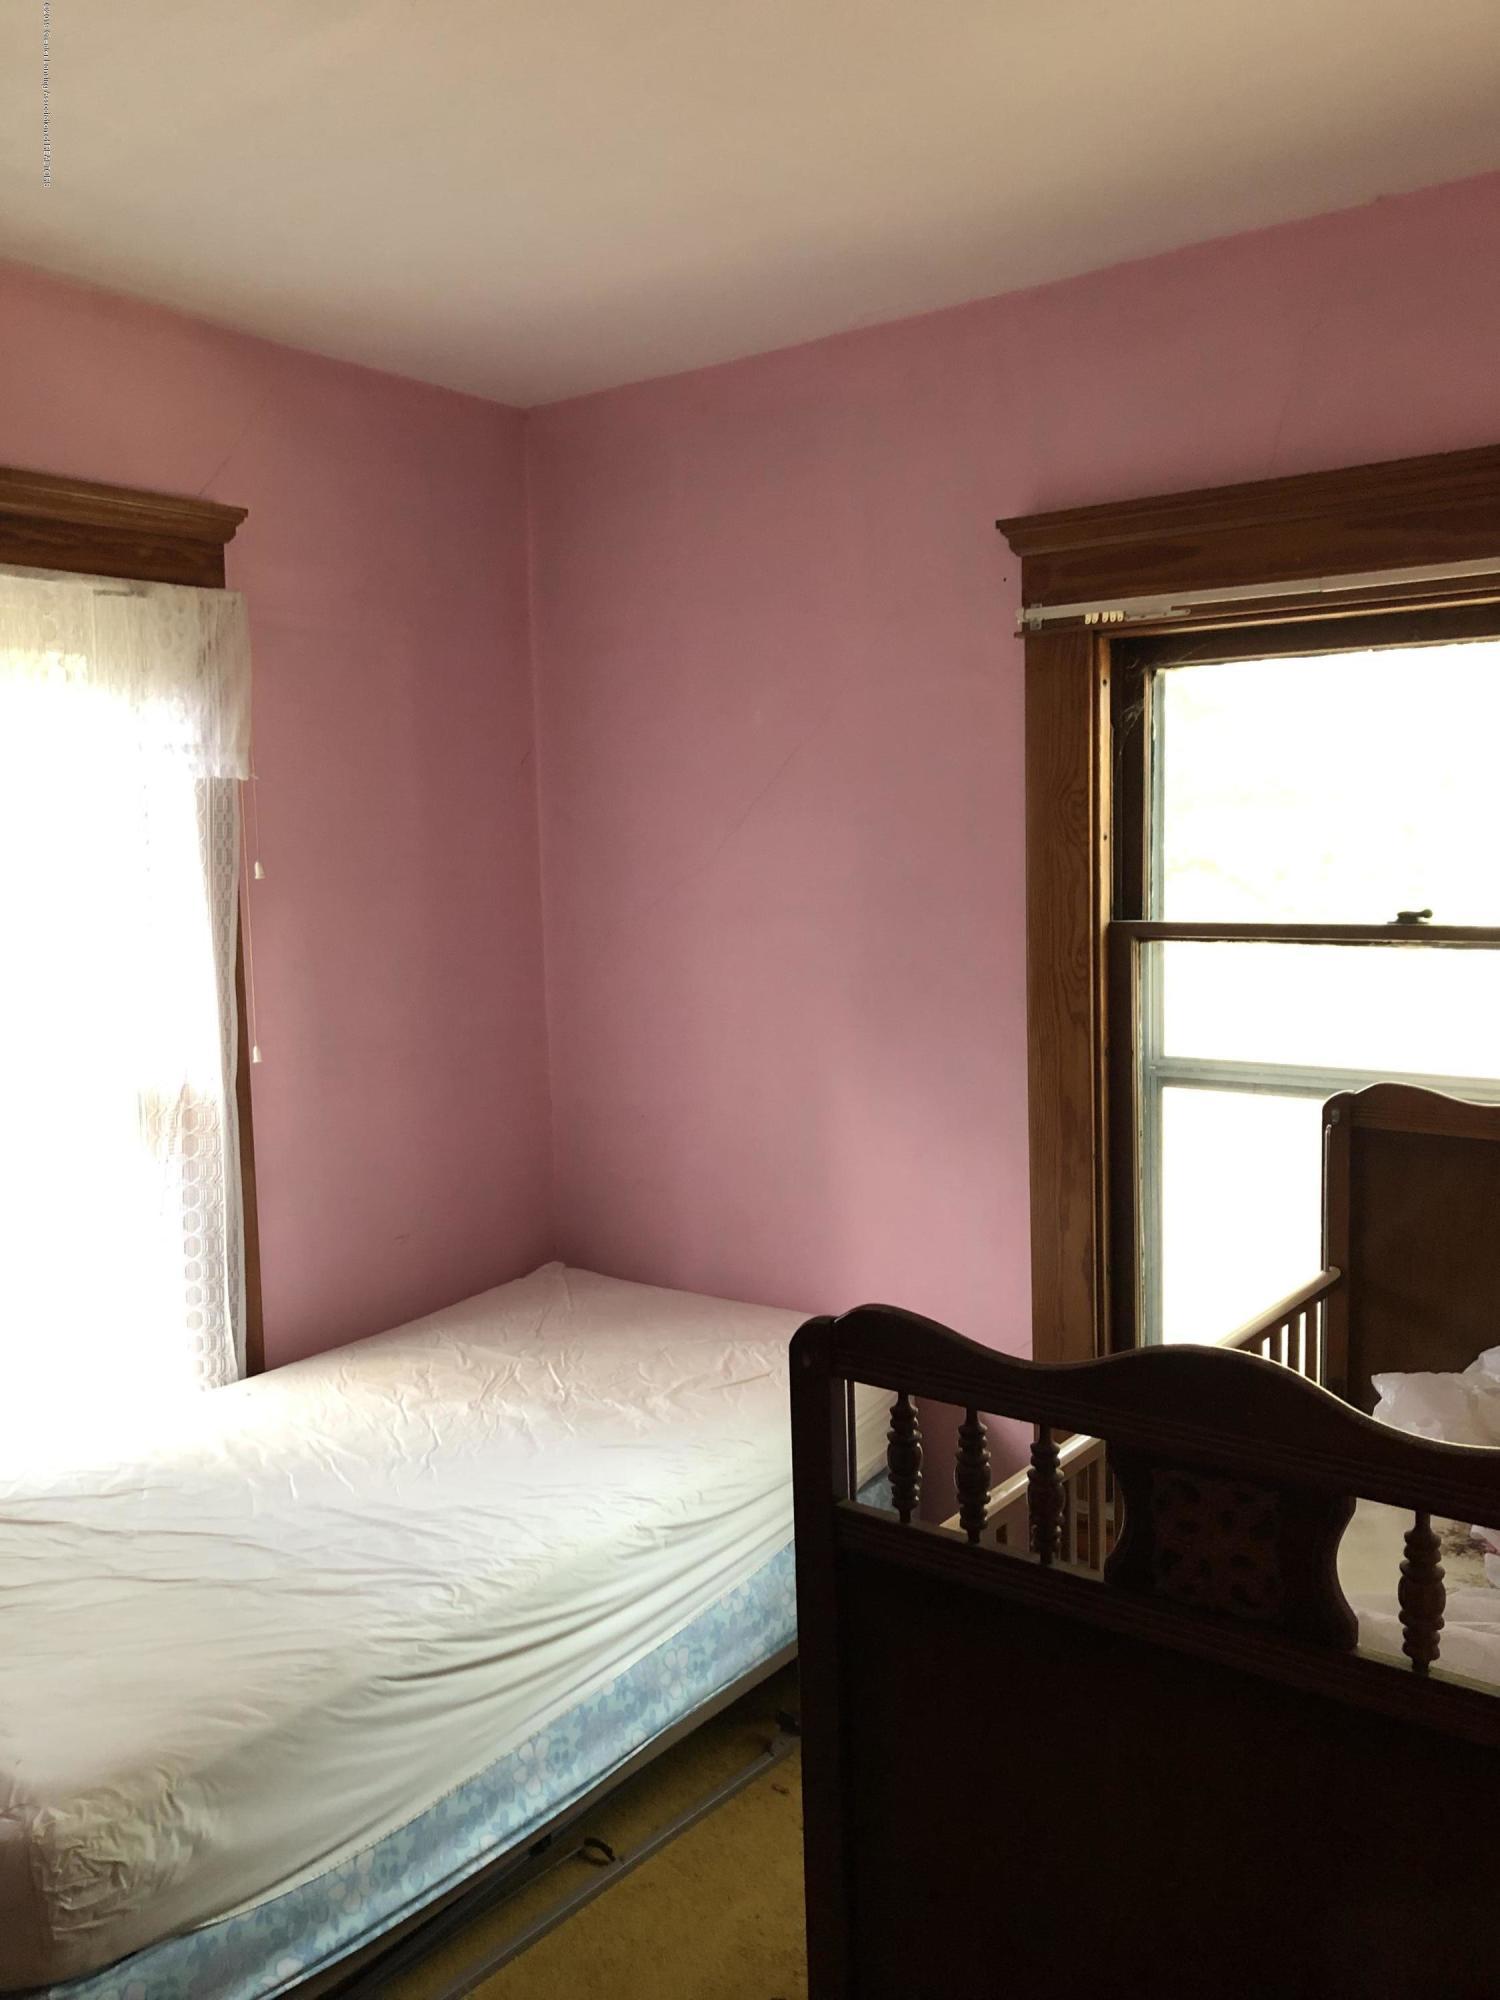 6748 W Beard Rd - 2nd floor bedroom2 - 27